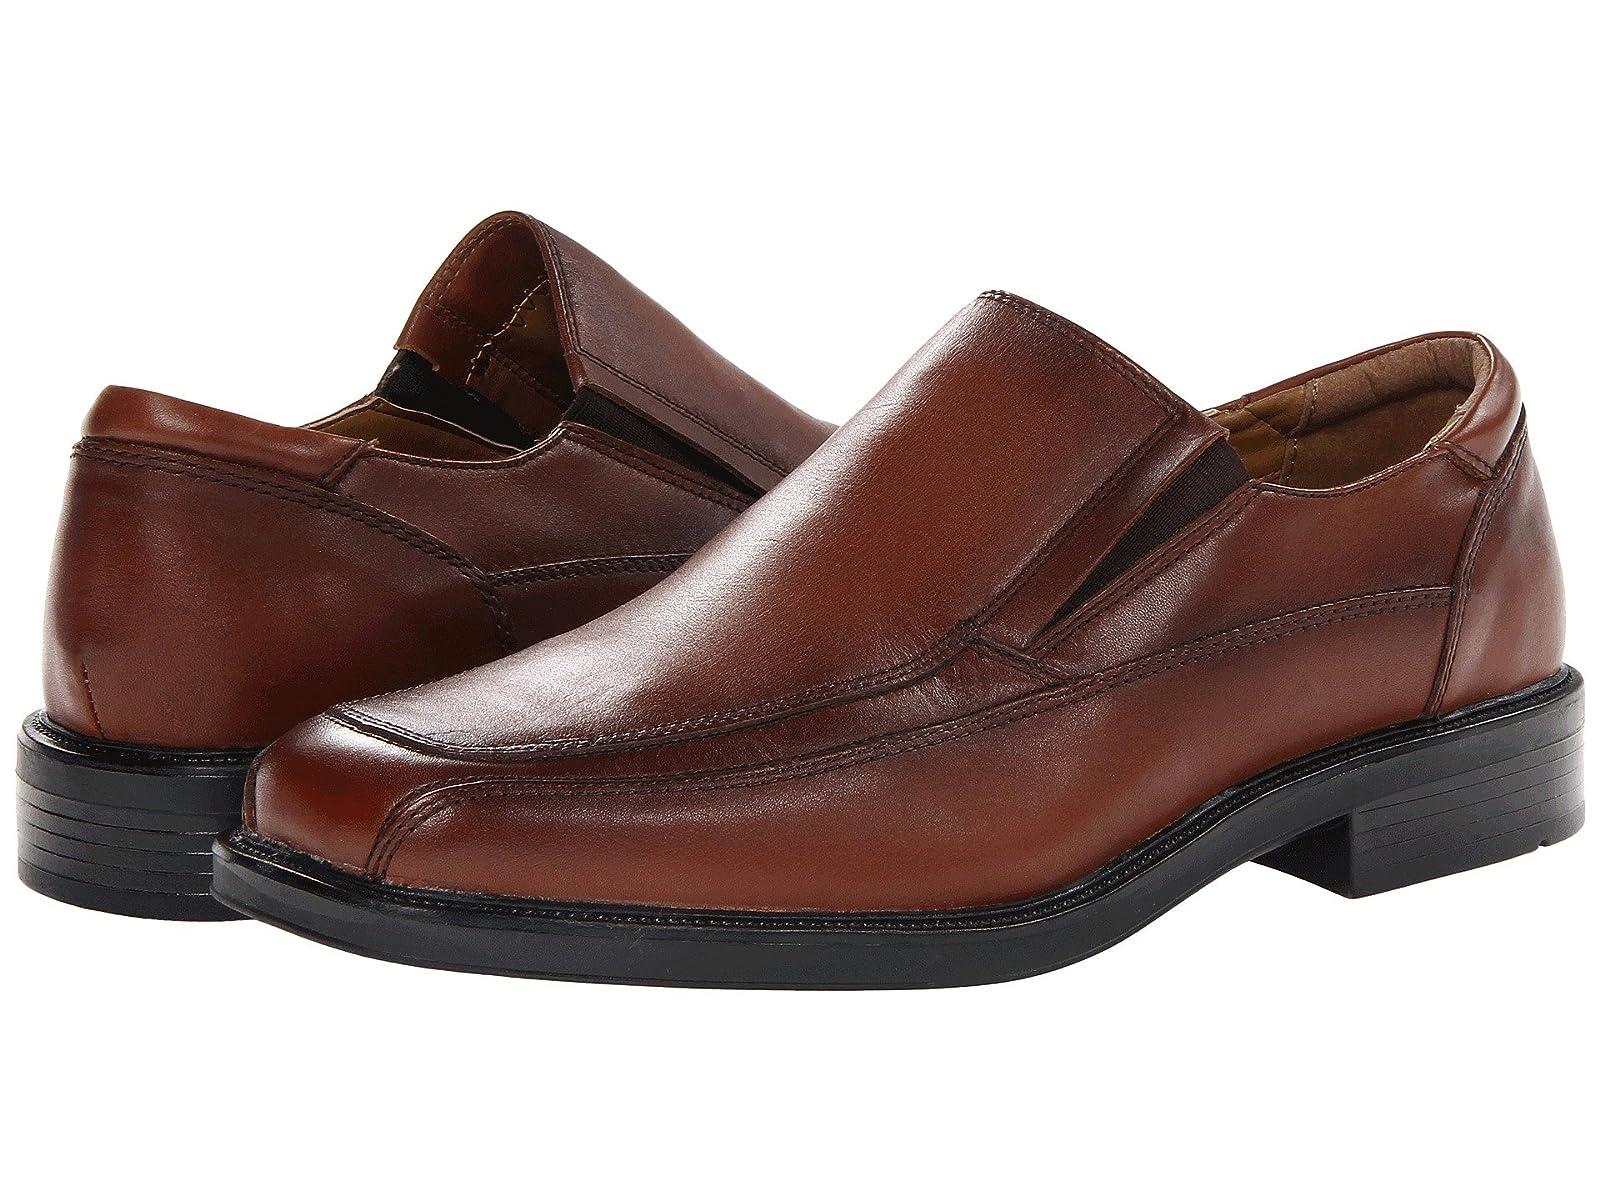 Dockers Proposal Moc Toe LoaferAtmospheric grades have affordable shoes